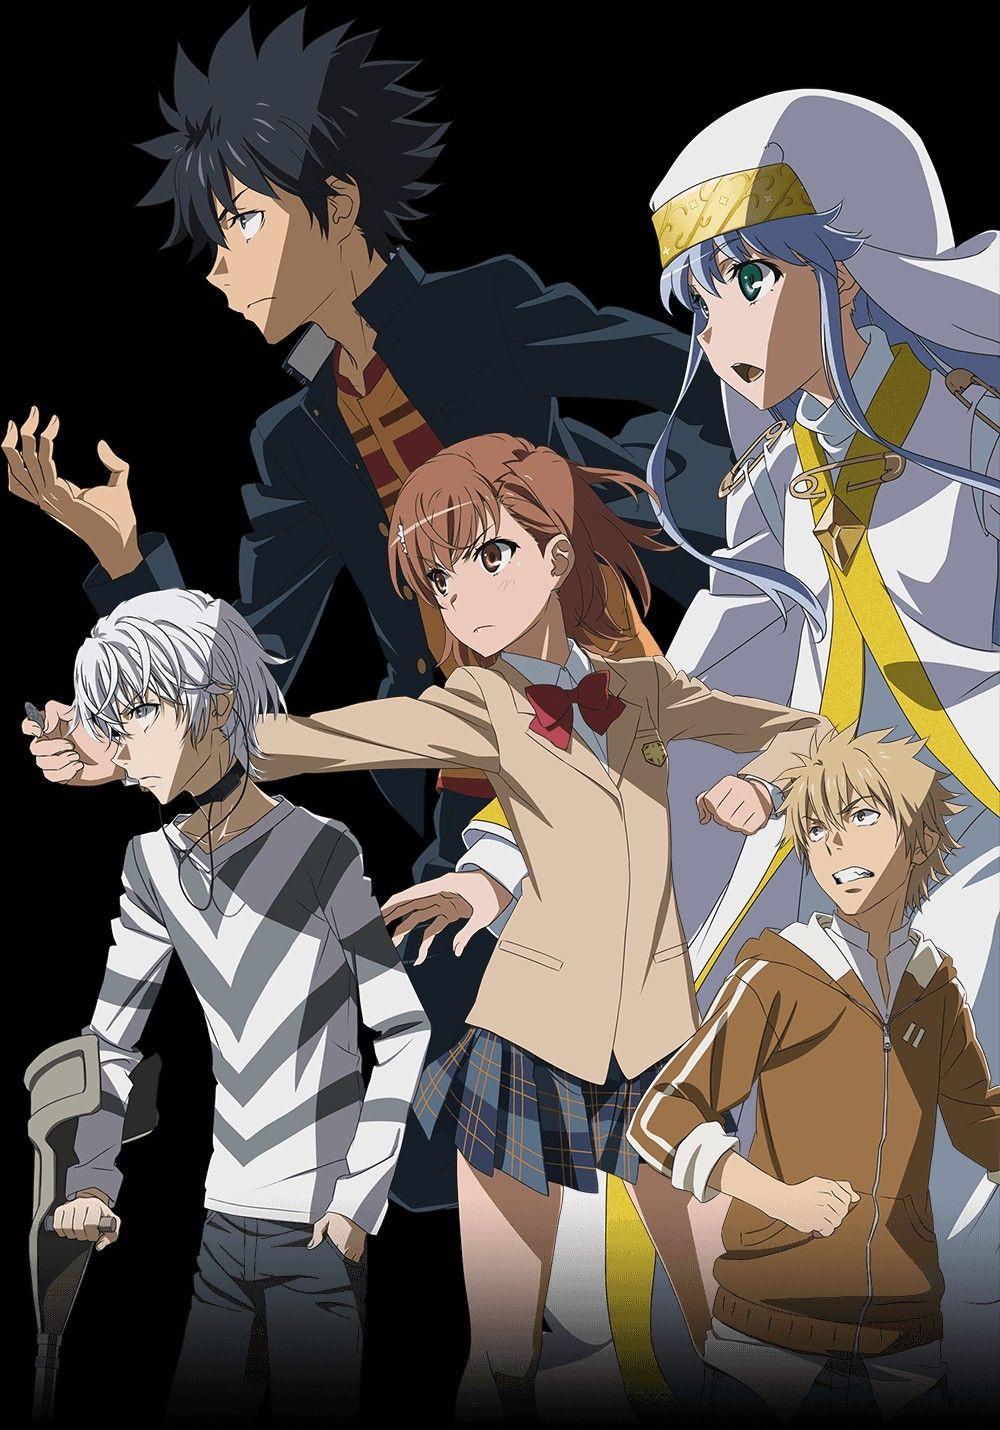 Pin By Dx Dimi On とある Anime Anime Art Fantasy Charlotte Anime